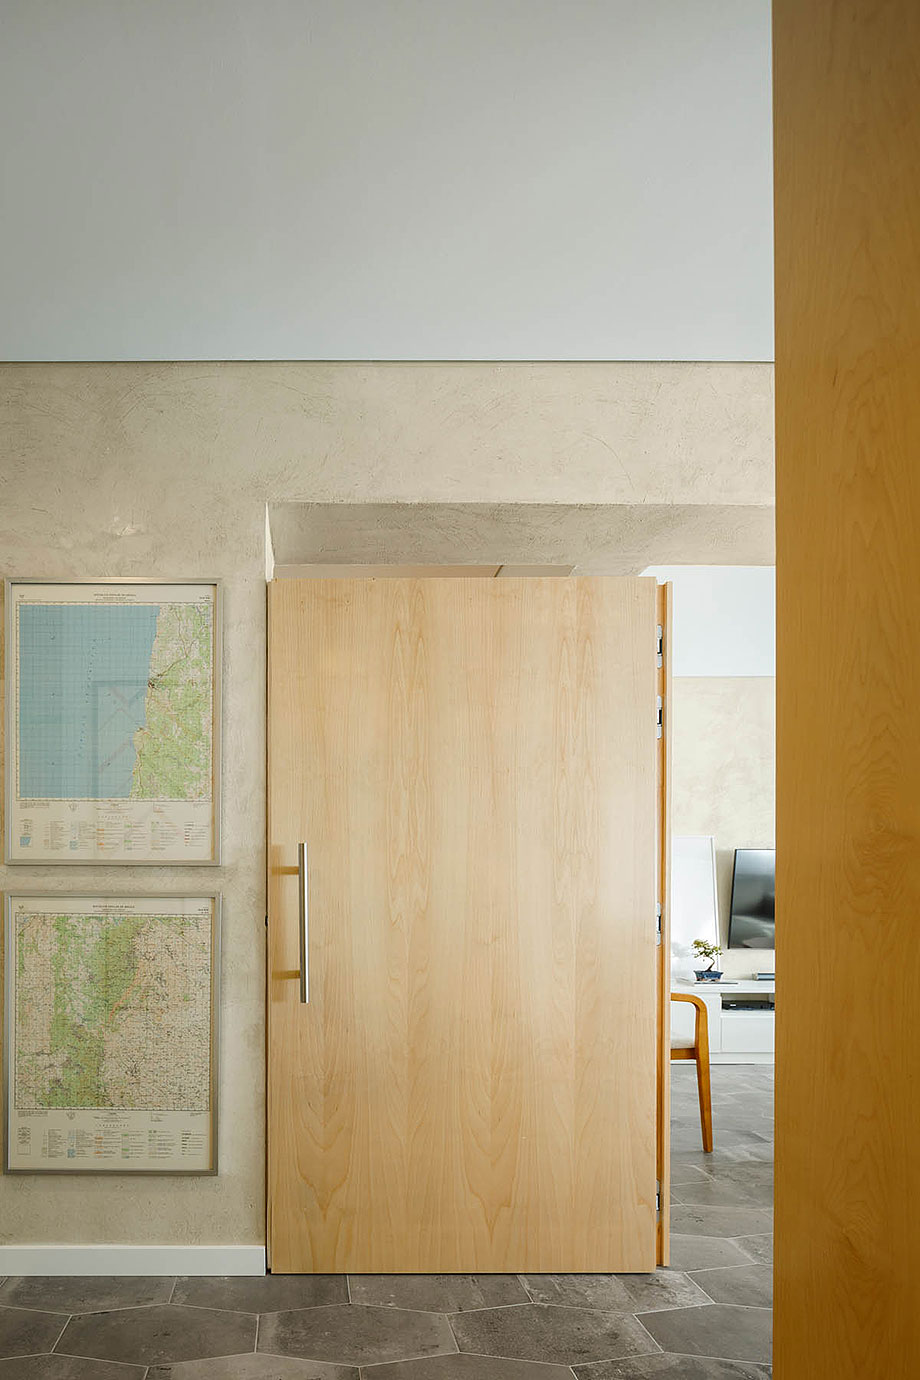 apartamento en oporto por paulo moreira architectures (7) - foto ivo tavares